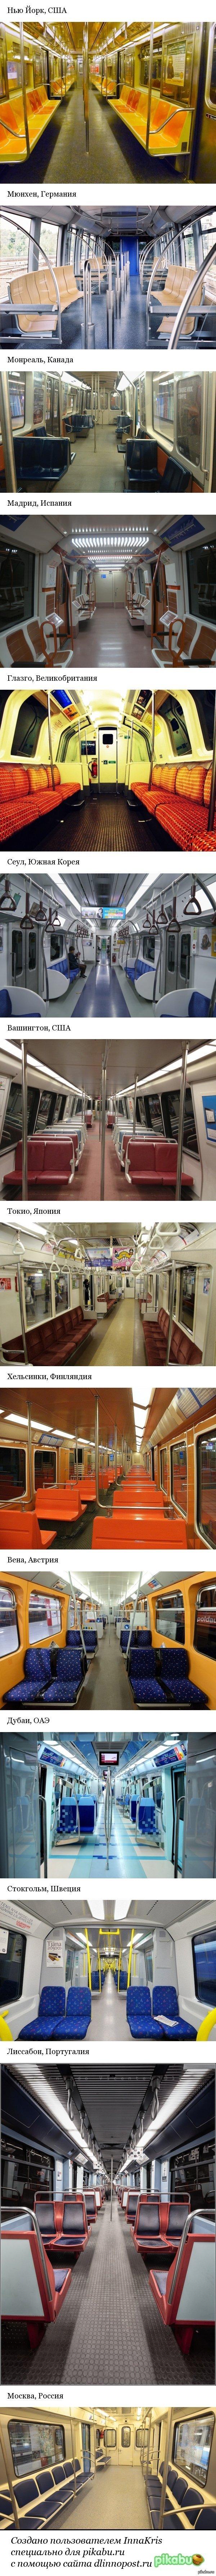 вагоны-метро-мира